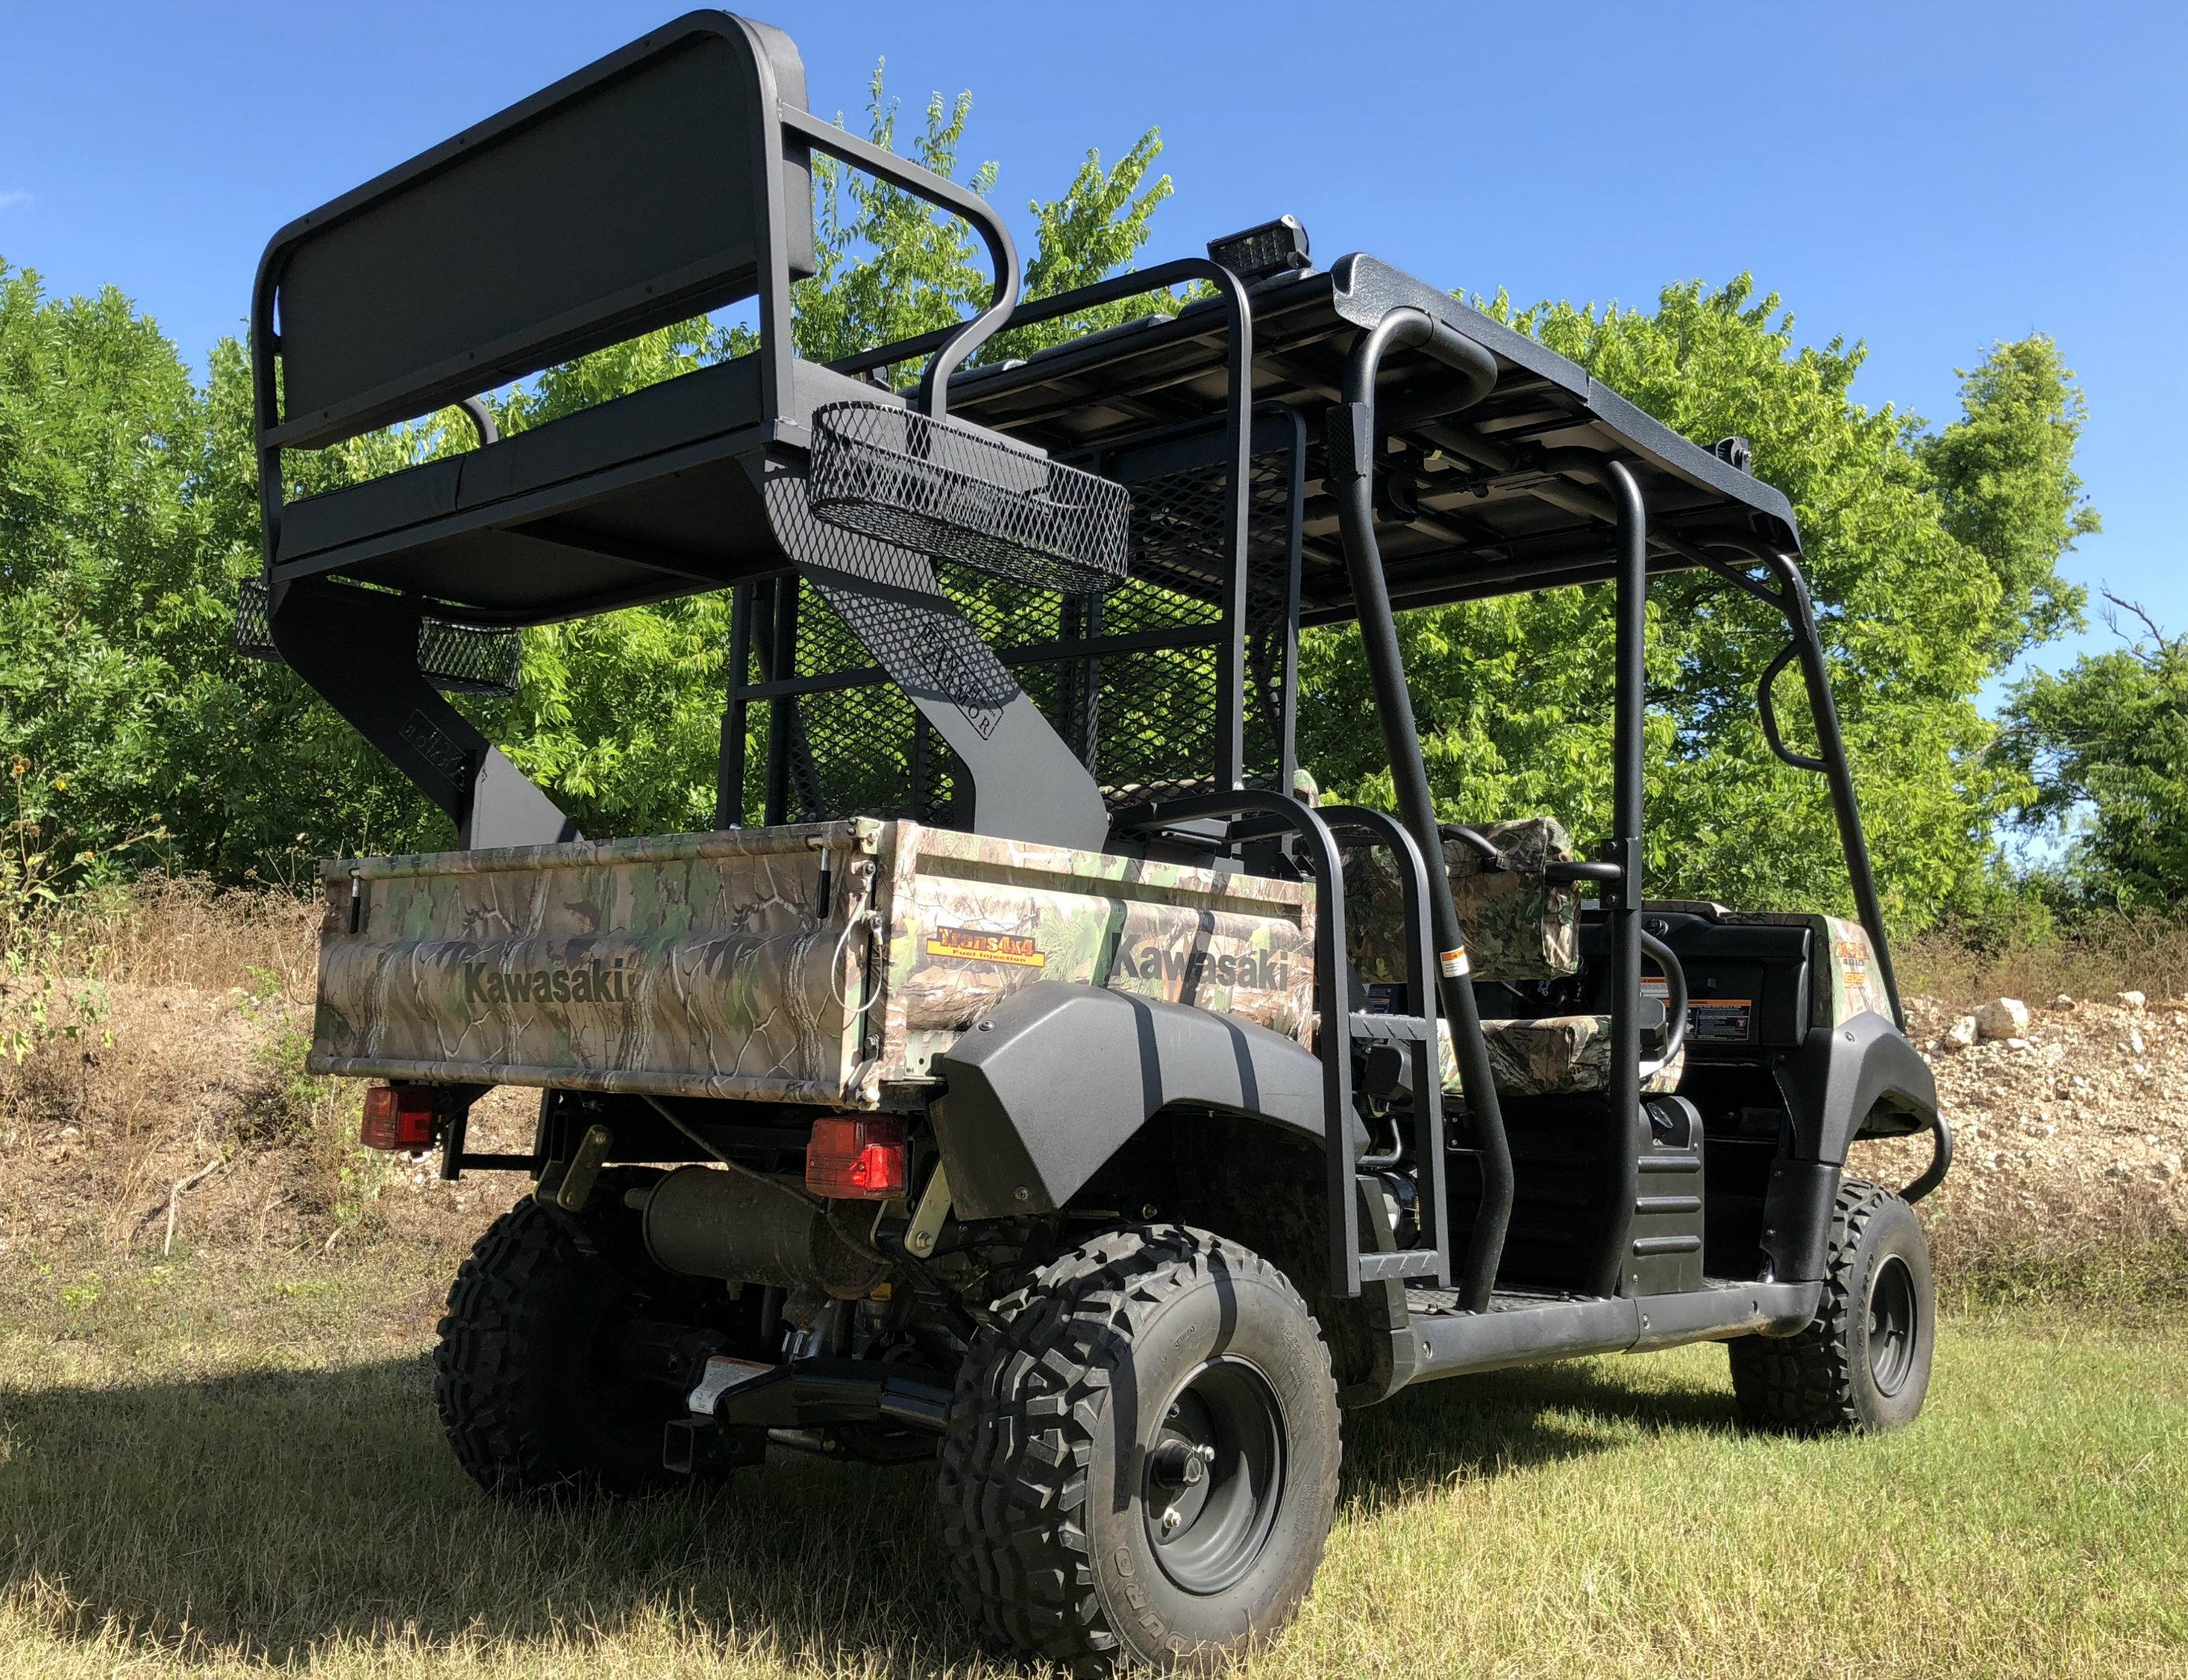 kawasaki-mule-trans-3010-4010-high-seat-hunting-rack.jpg